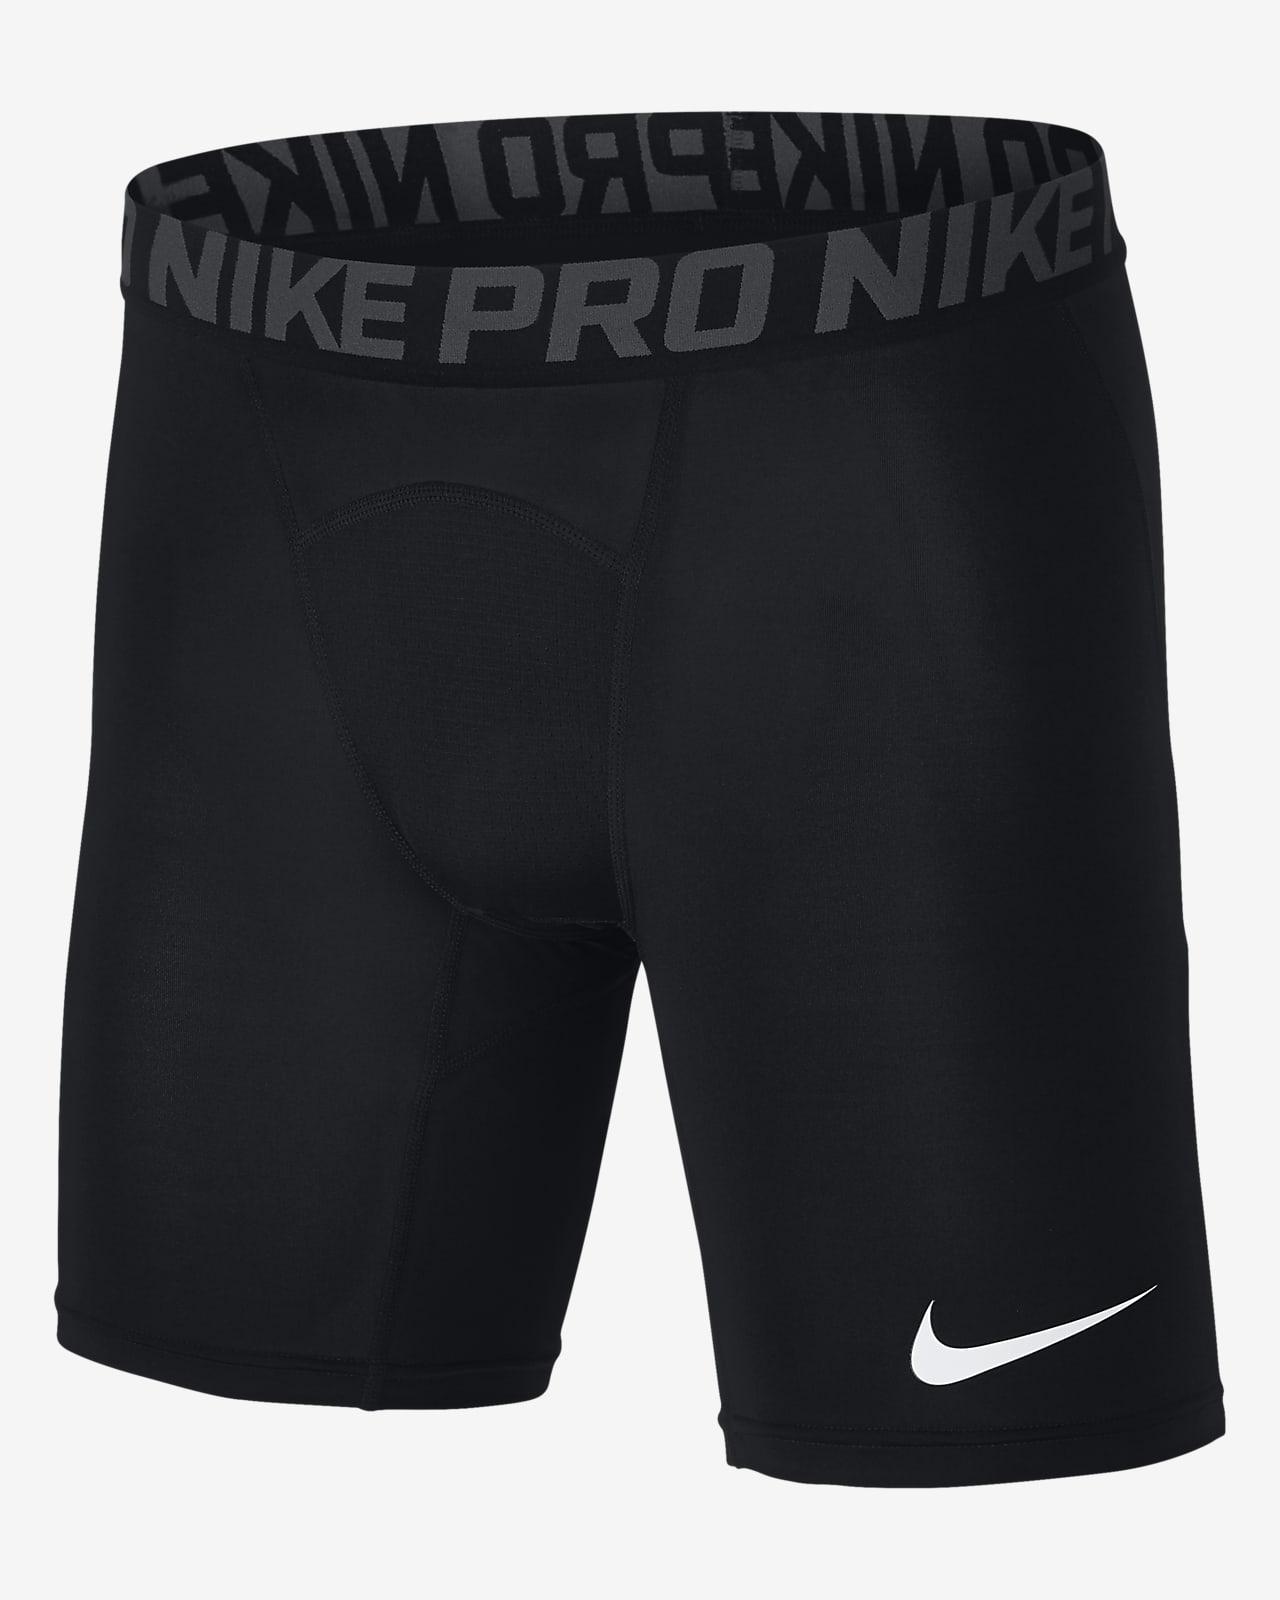 "Nike Pro Men's 6"" (15cm approx.) Training Shorts"